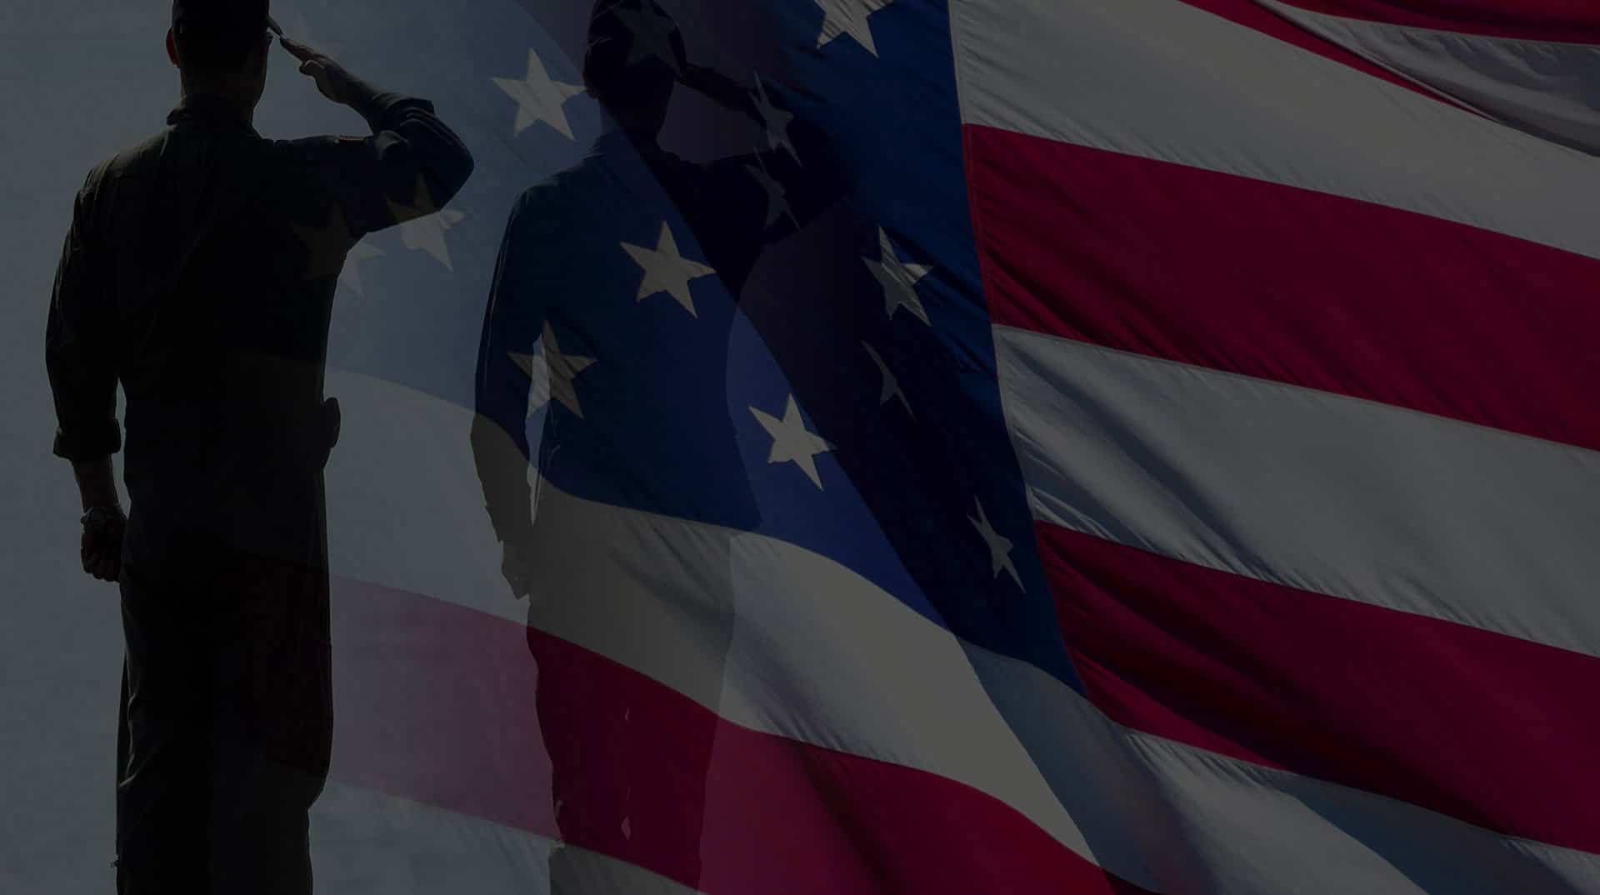 st. augustine veterans mortgage, st. augustine va mortgage, st. augustine va loan, st. augustine va mortgage, st. augustine mortgage